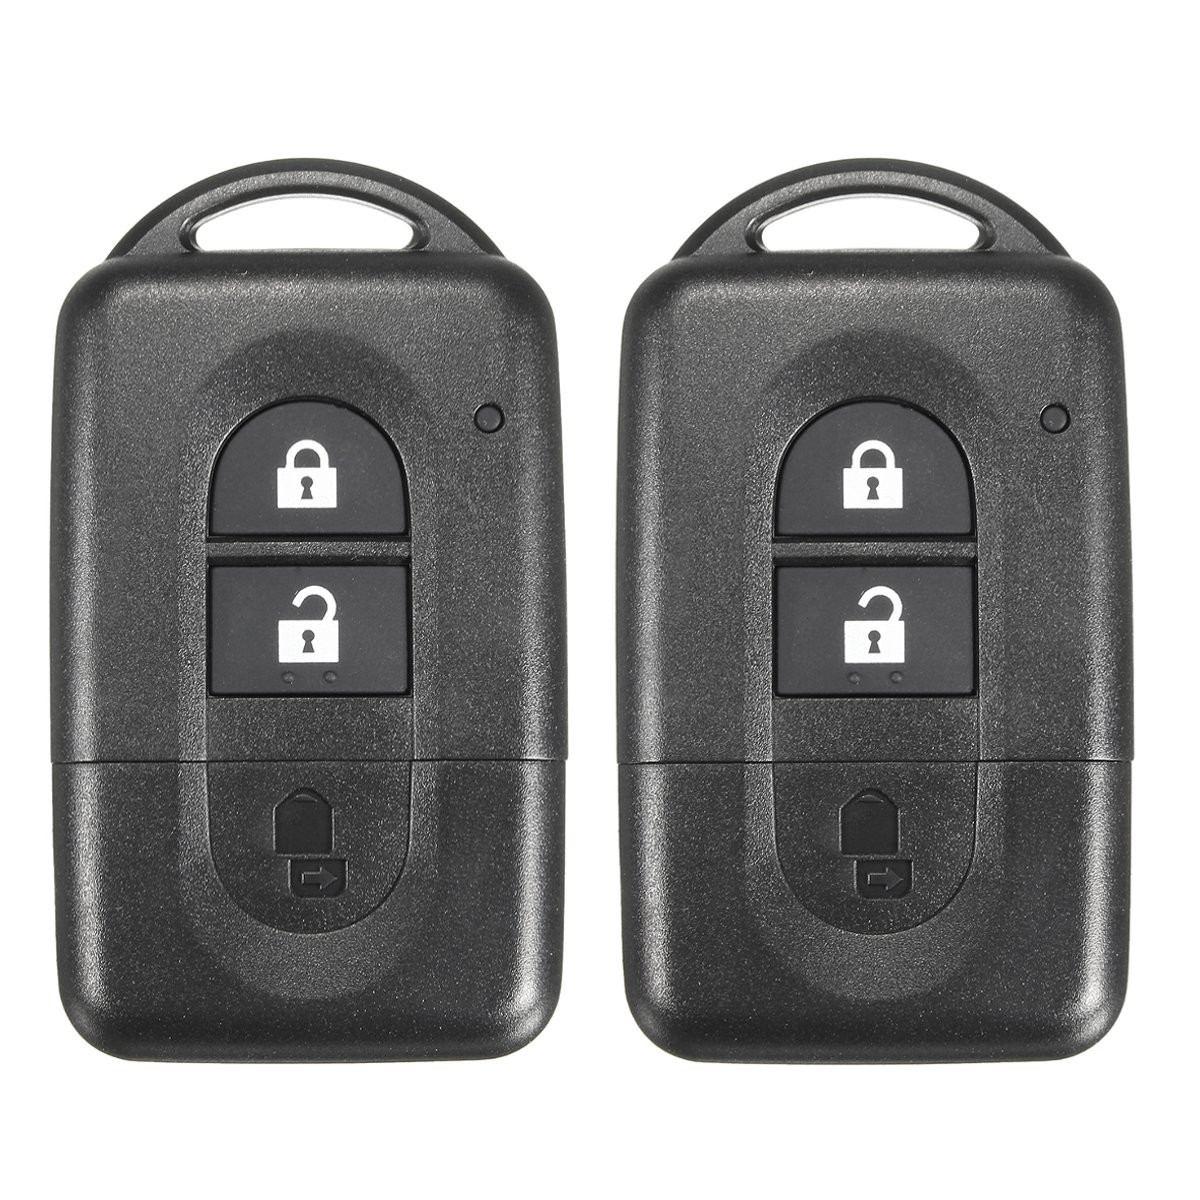 2PCS 2 Button Car Remote Smart Key FOB Case Shell For NISSAN MICRA X-TRAIL QASHQAI JUKE DUKE NAVARA